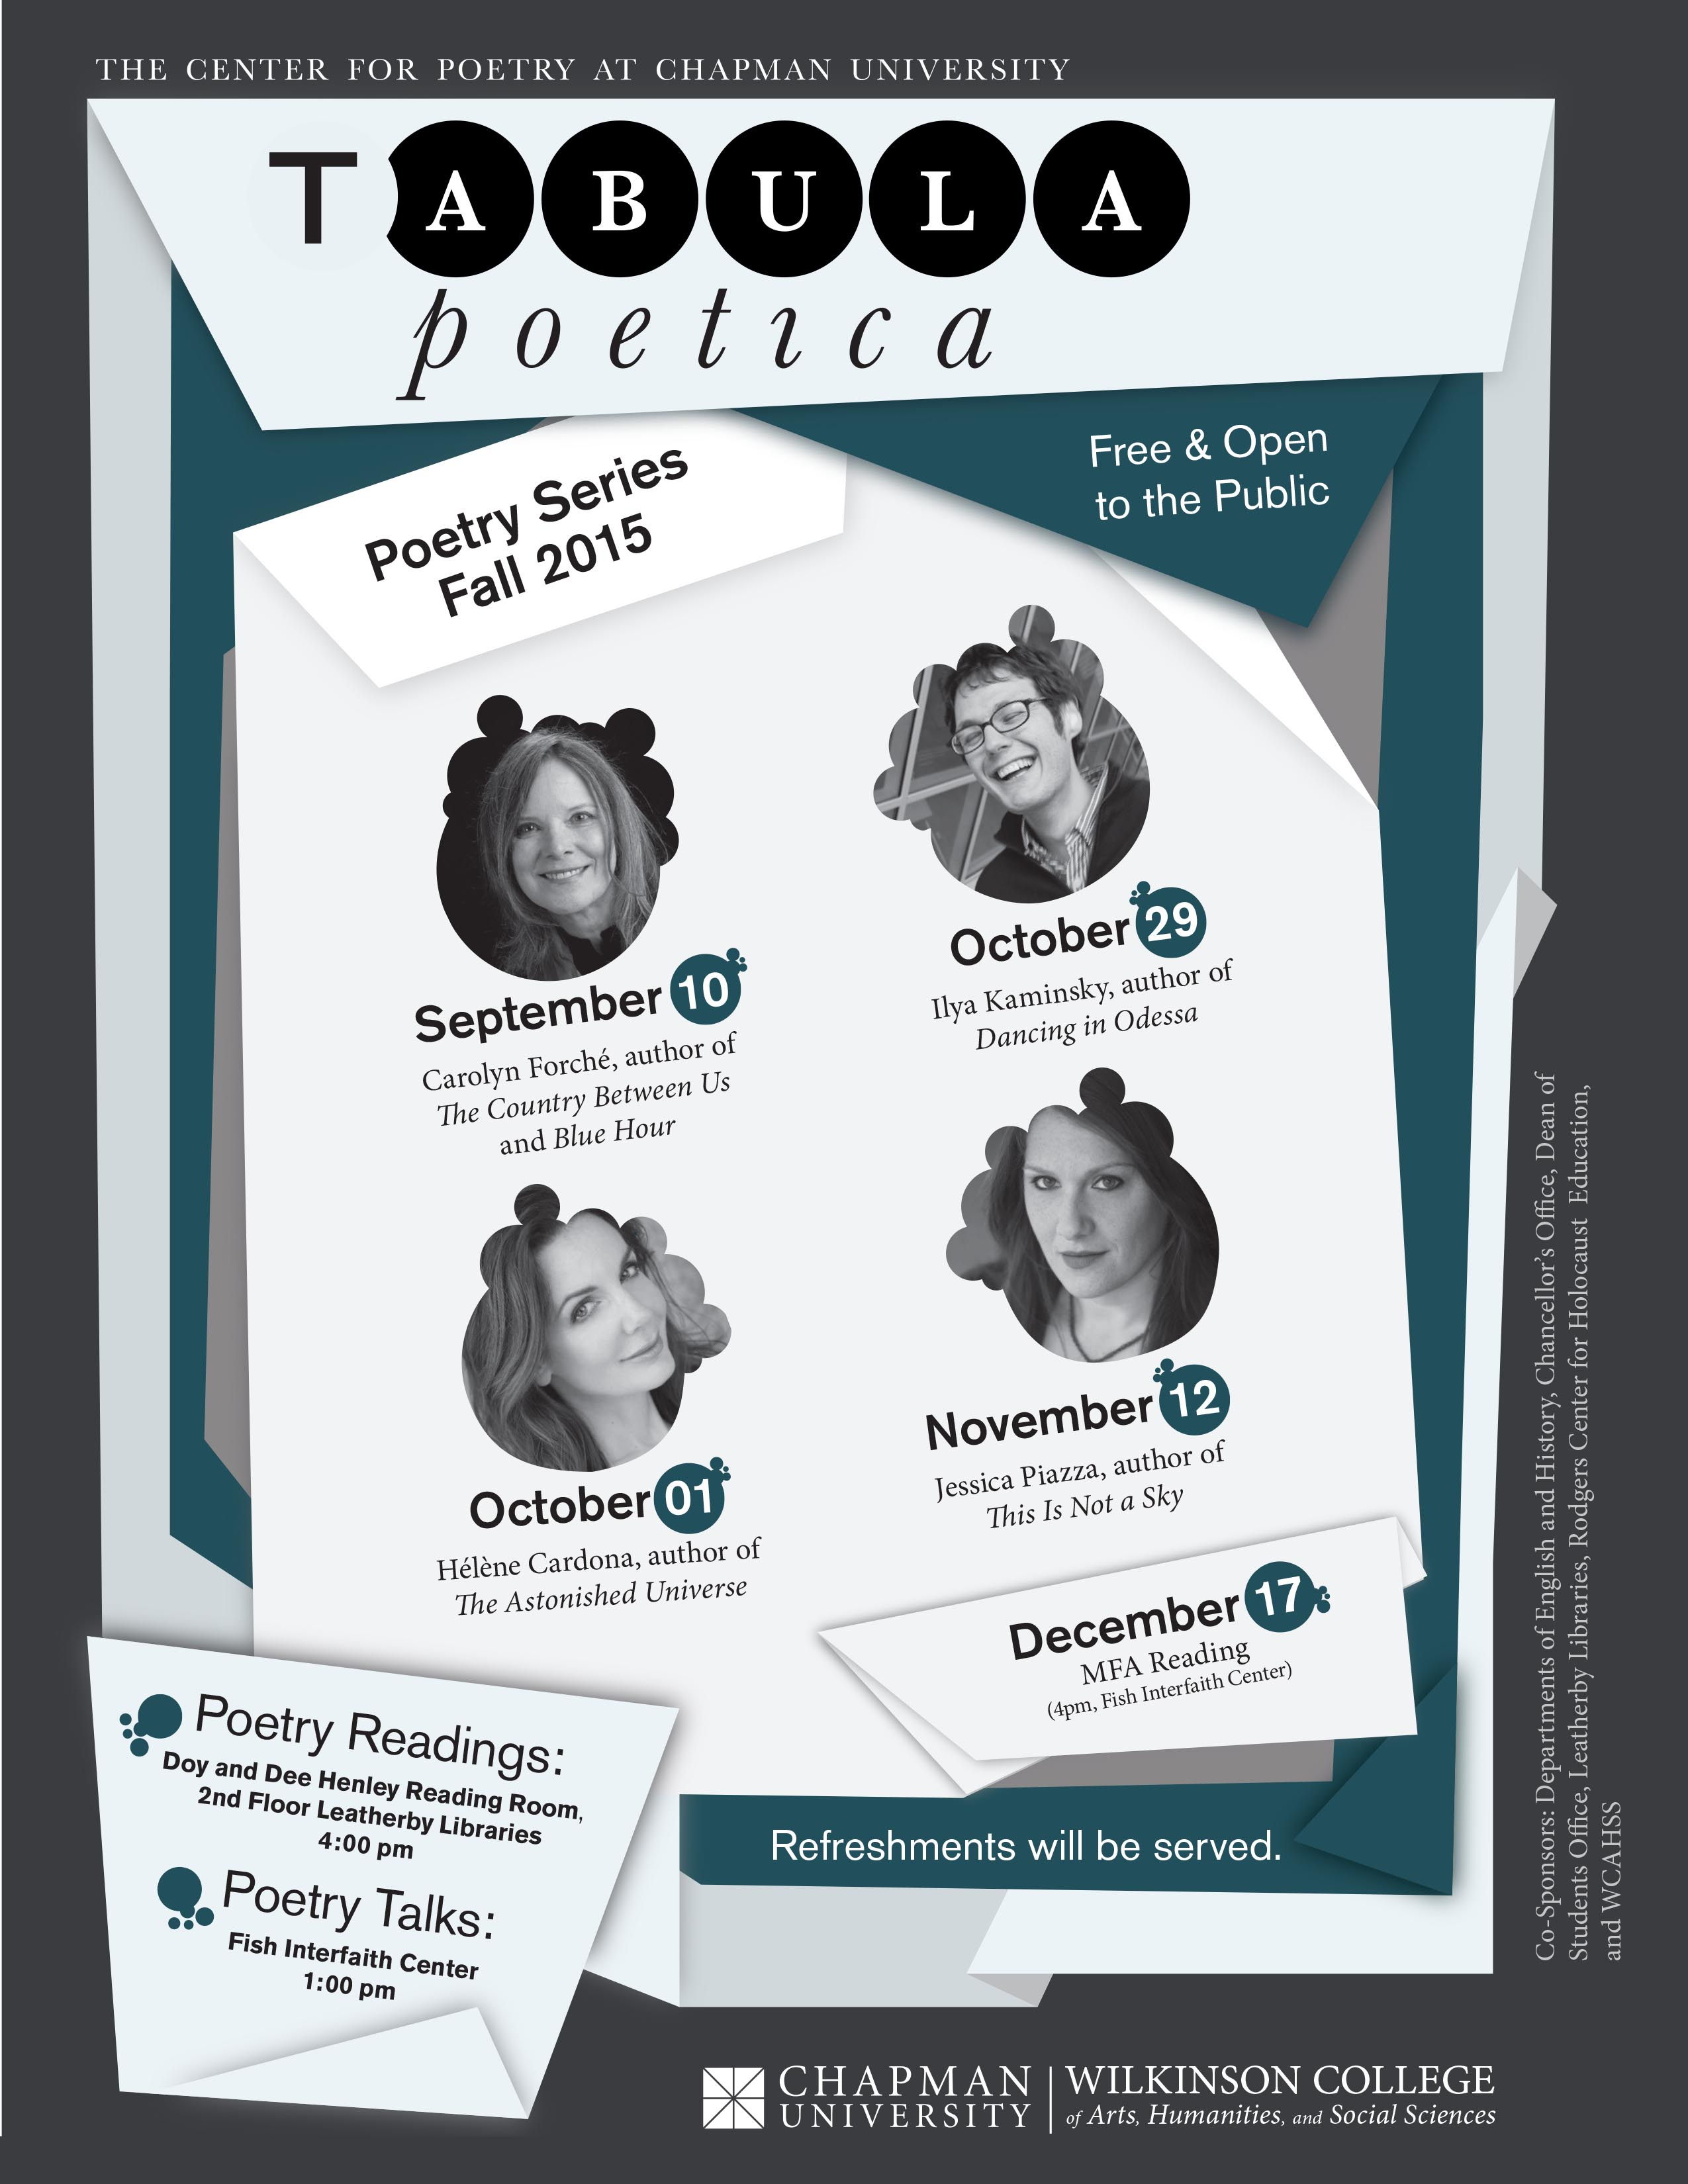 Flyer for Tabula Poetica.